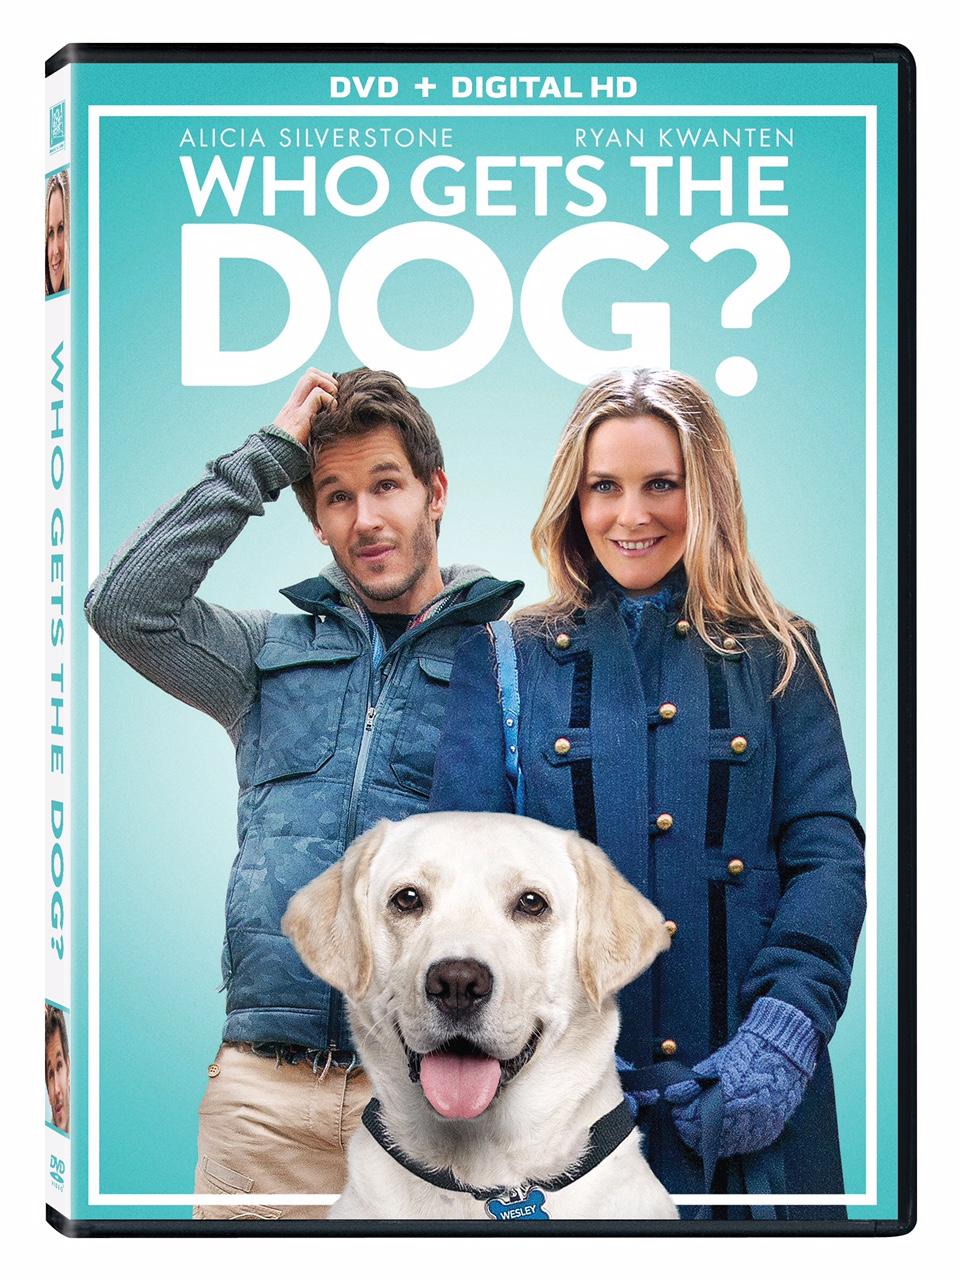 Angel Dog Film Review